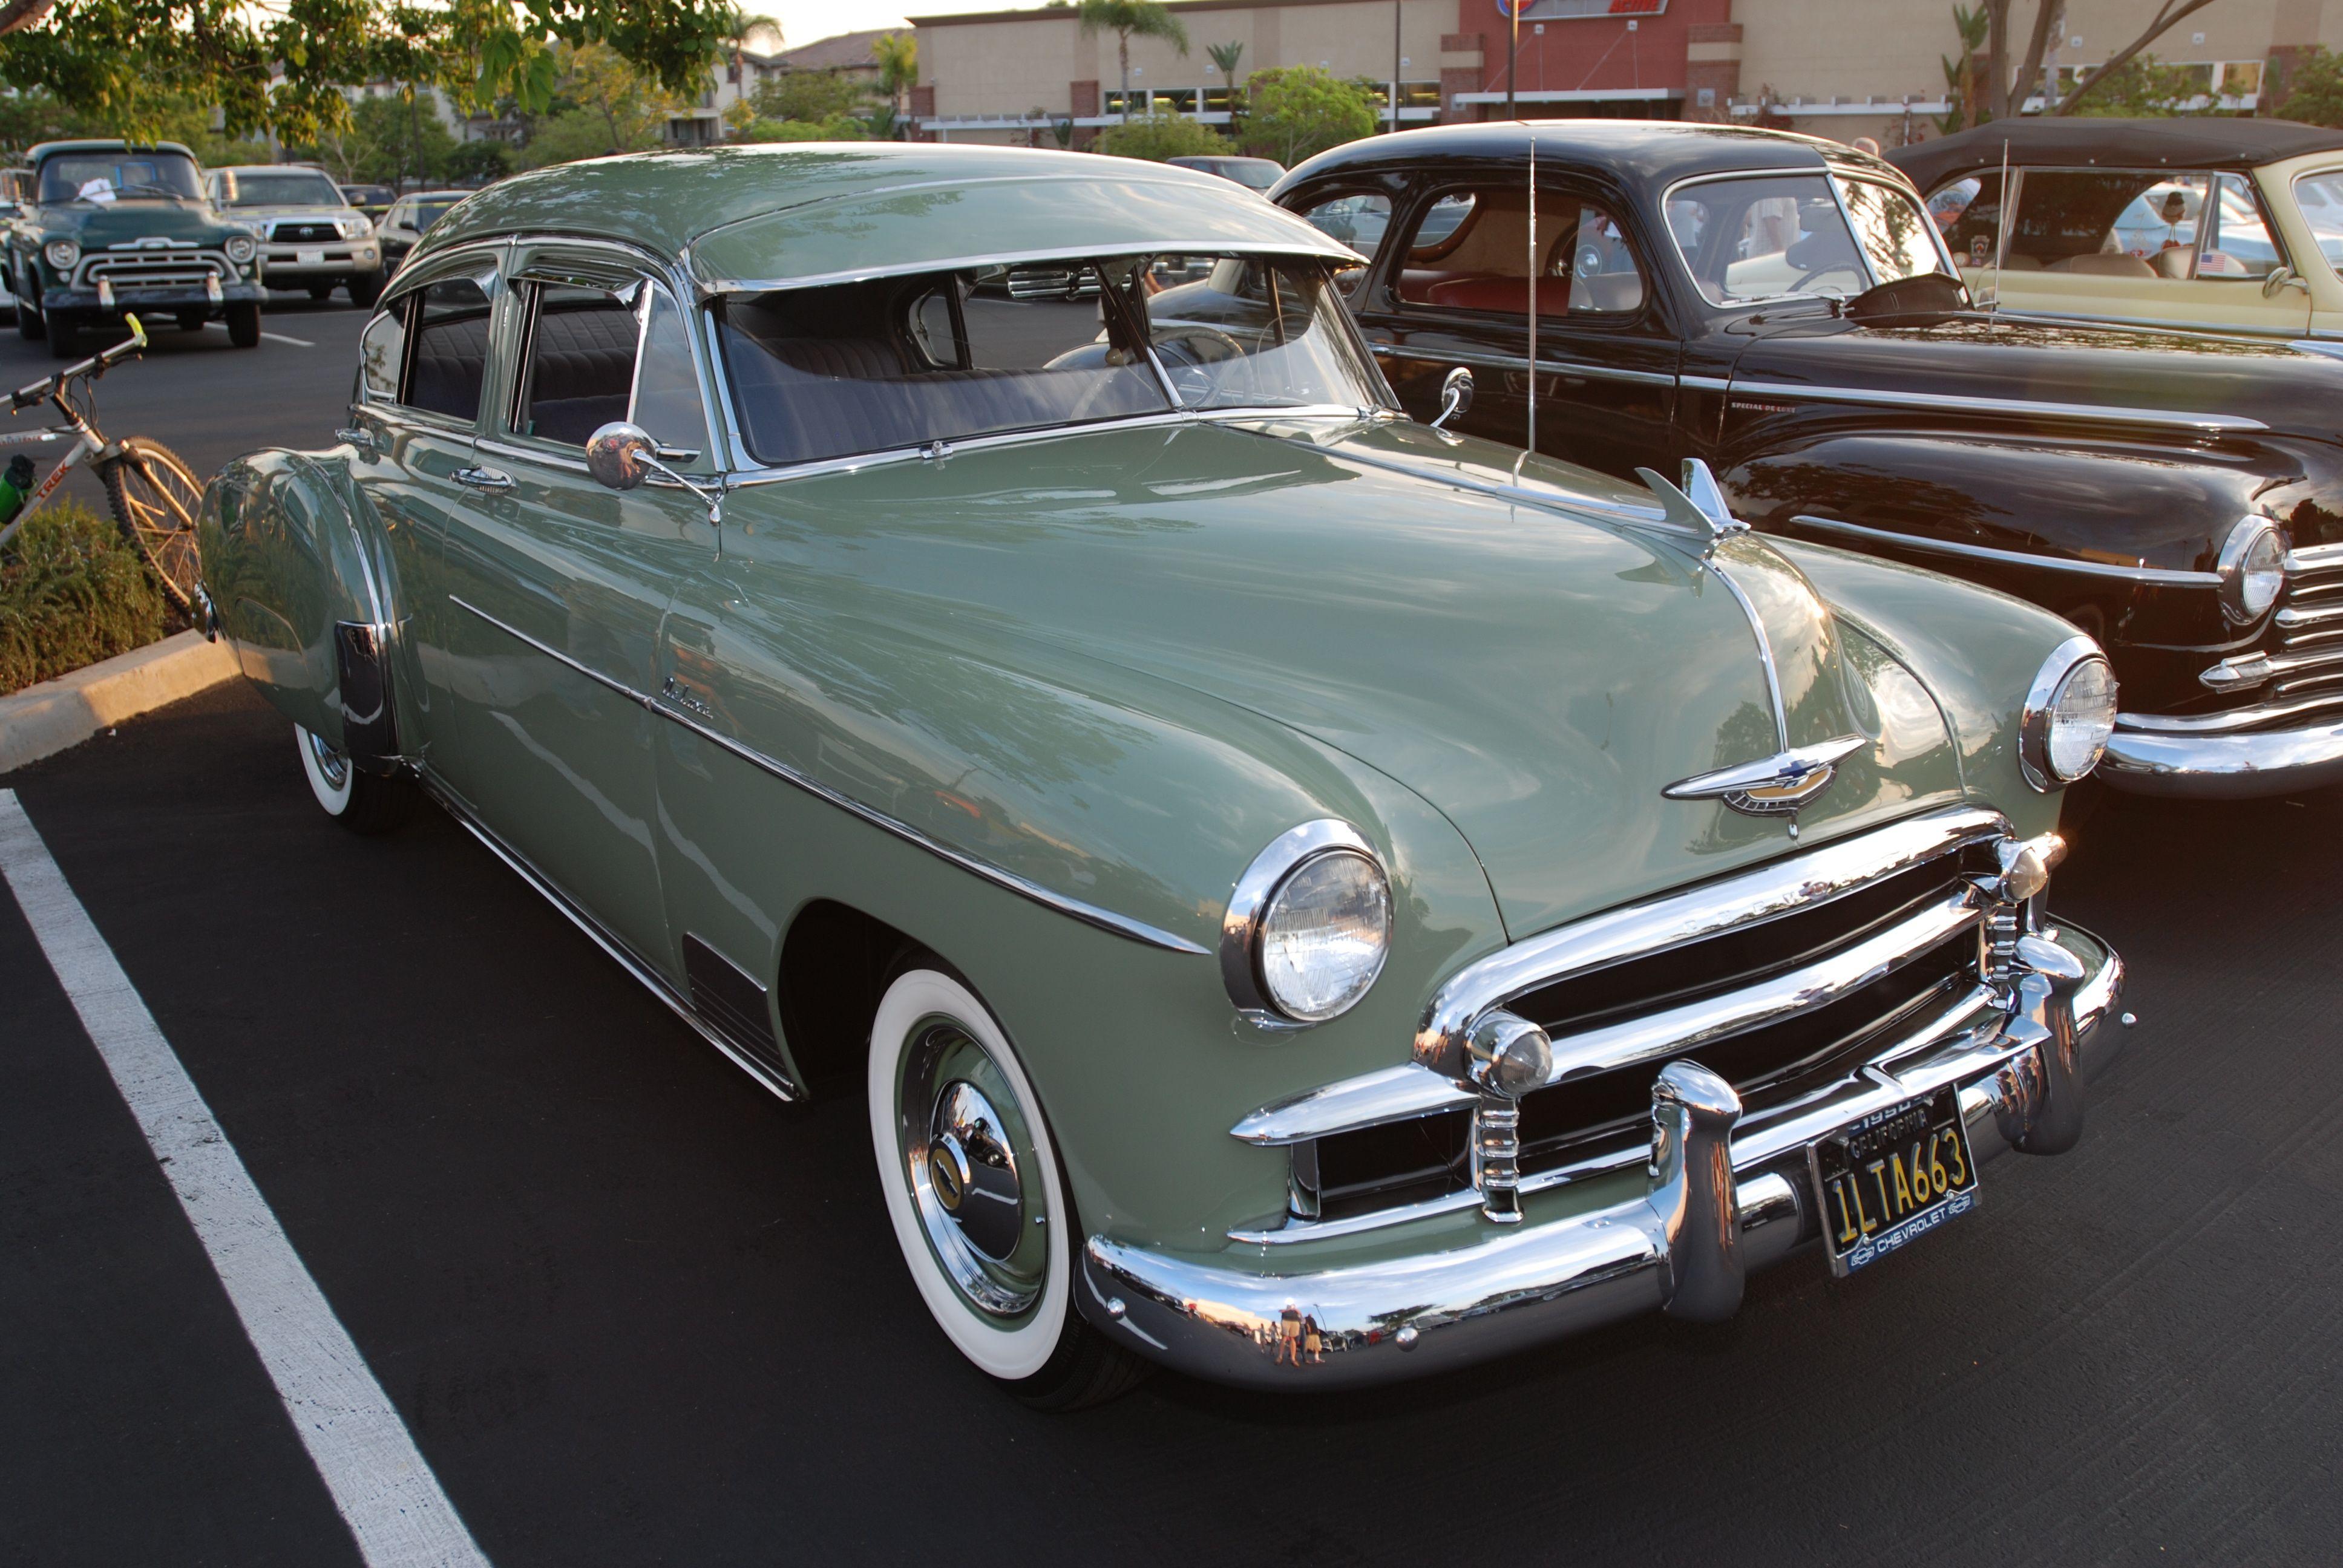 Dsc 0658 Jpg 3872 2592 Vintage Cars